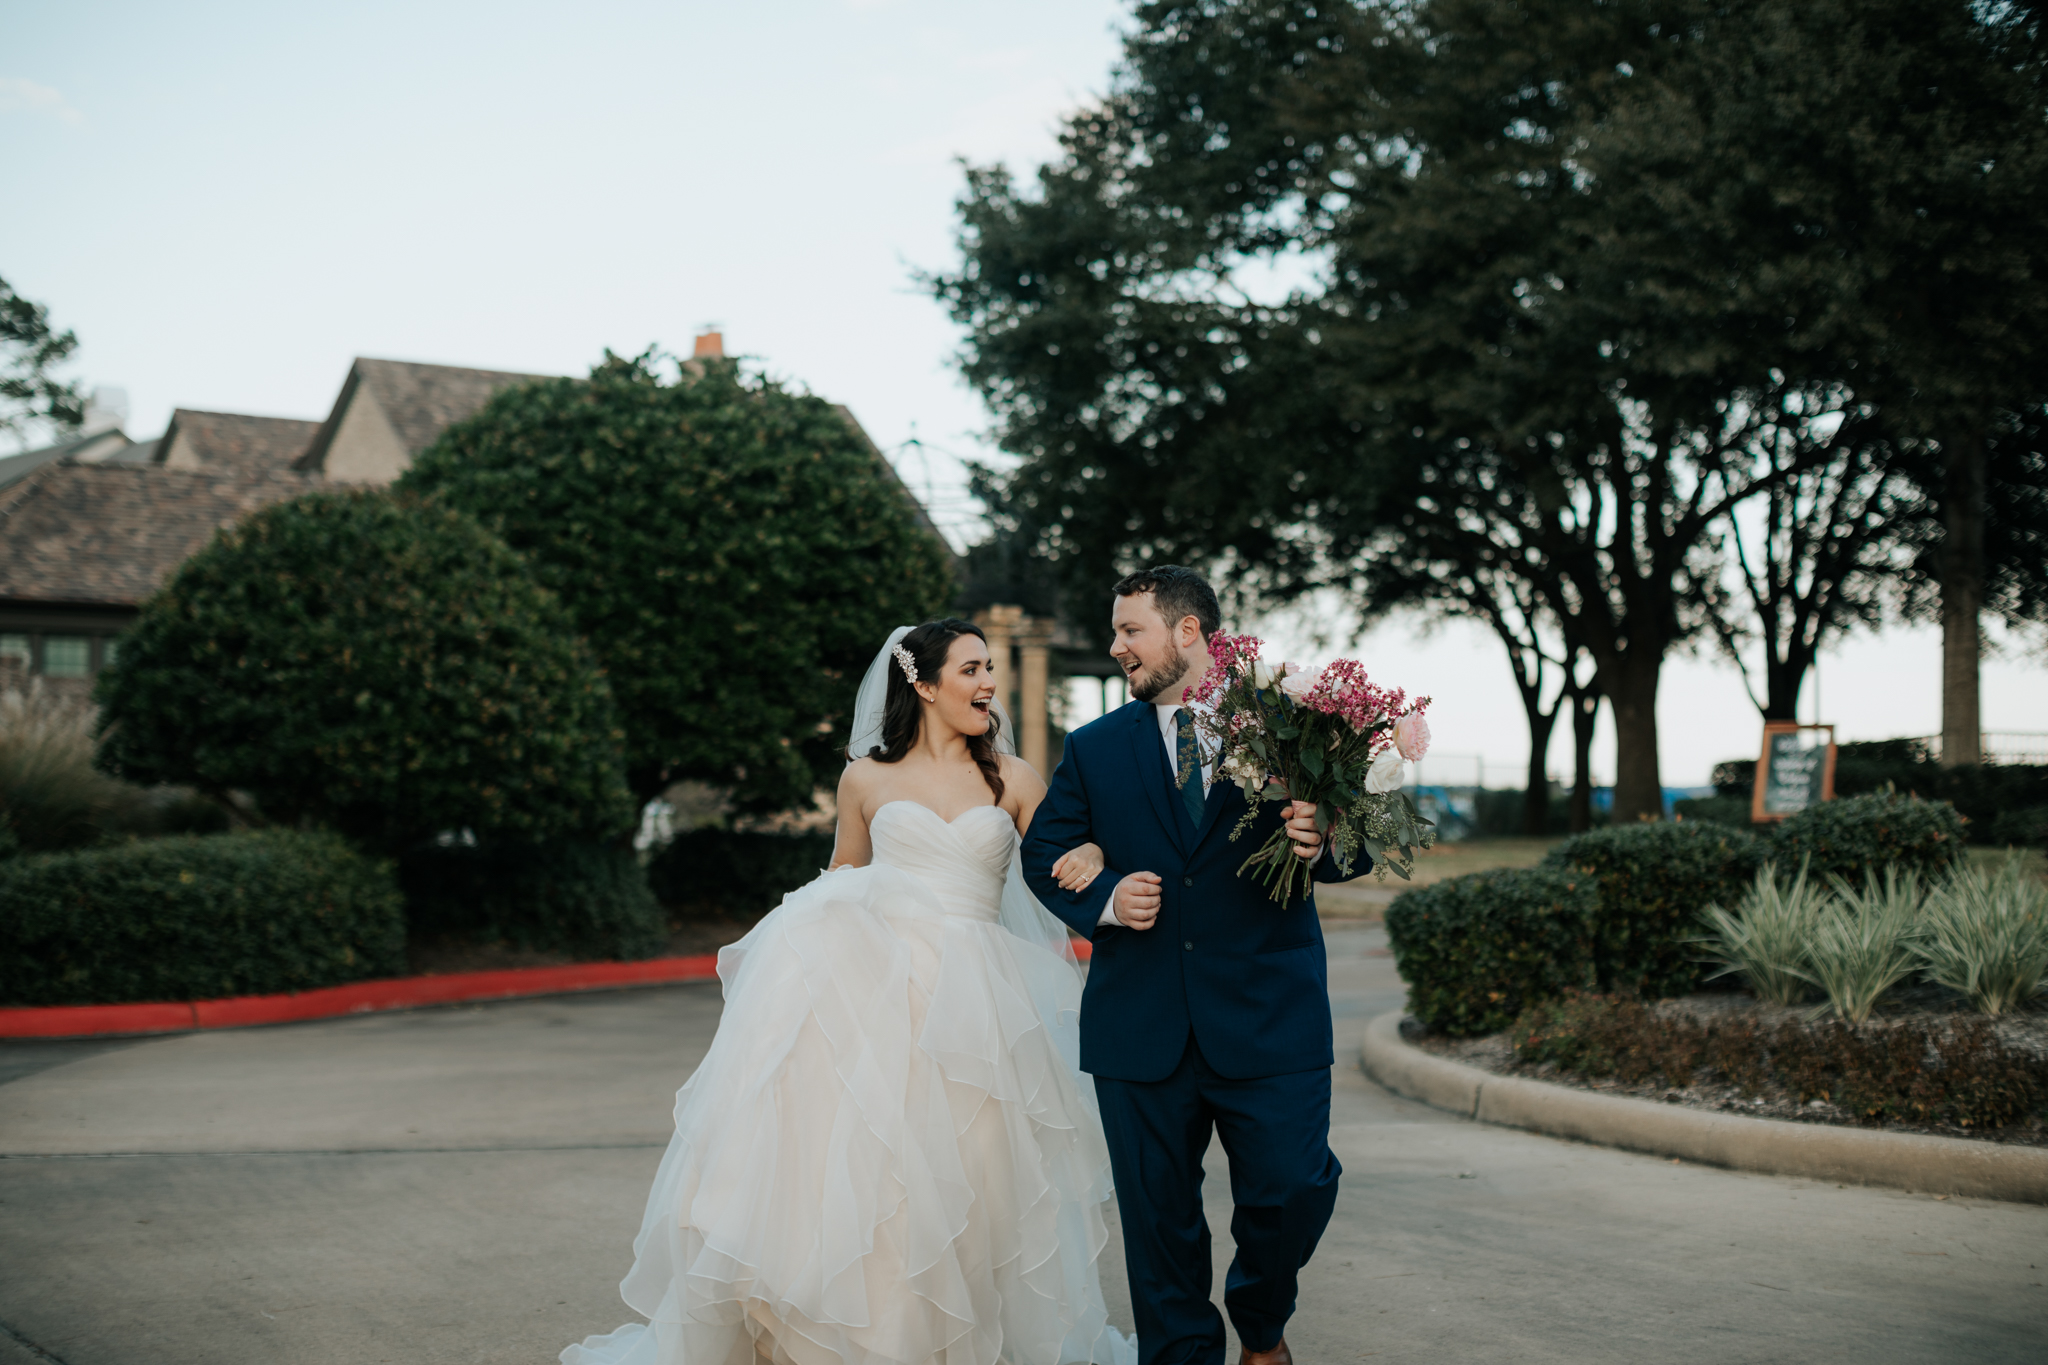 Leah Nicole Photography - Houston Wedding Photographer-Lake Conroe Wedding- Houston Wedding Photographer-38.jpg